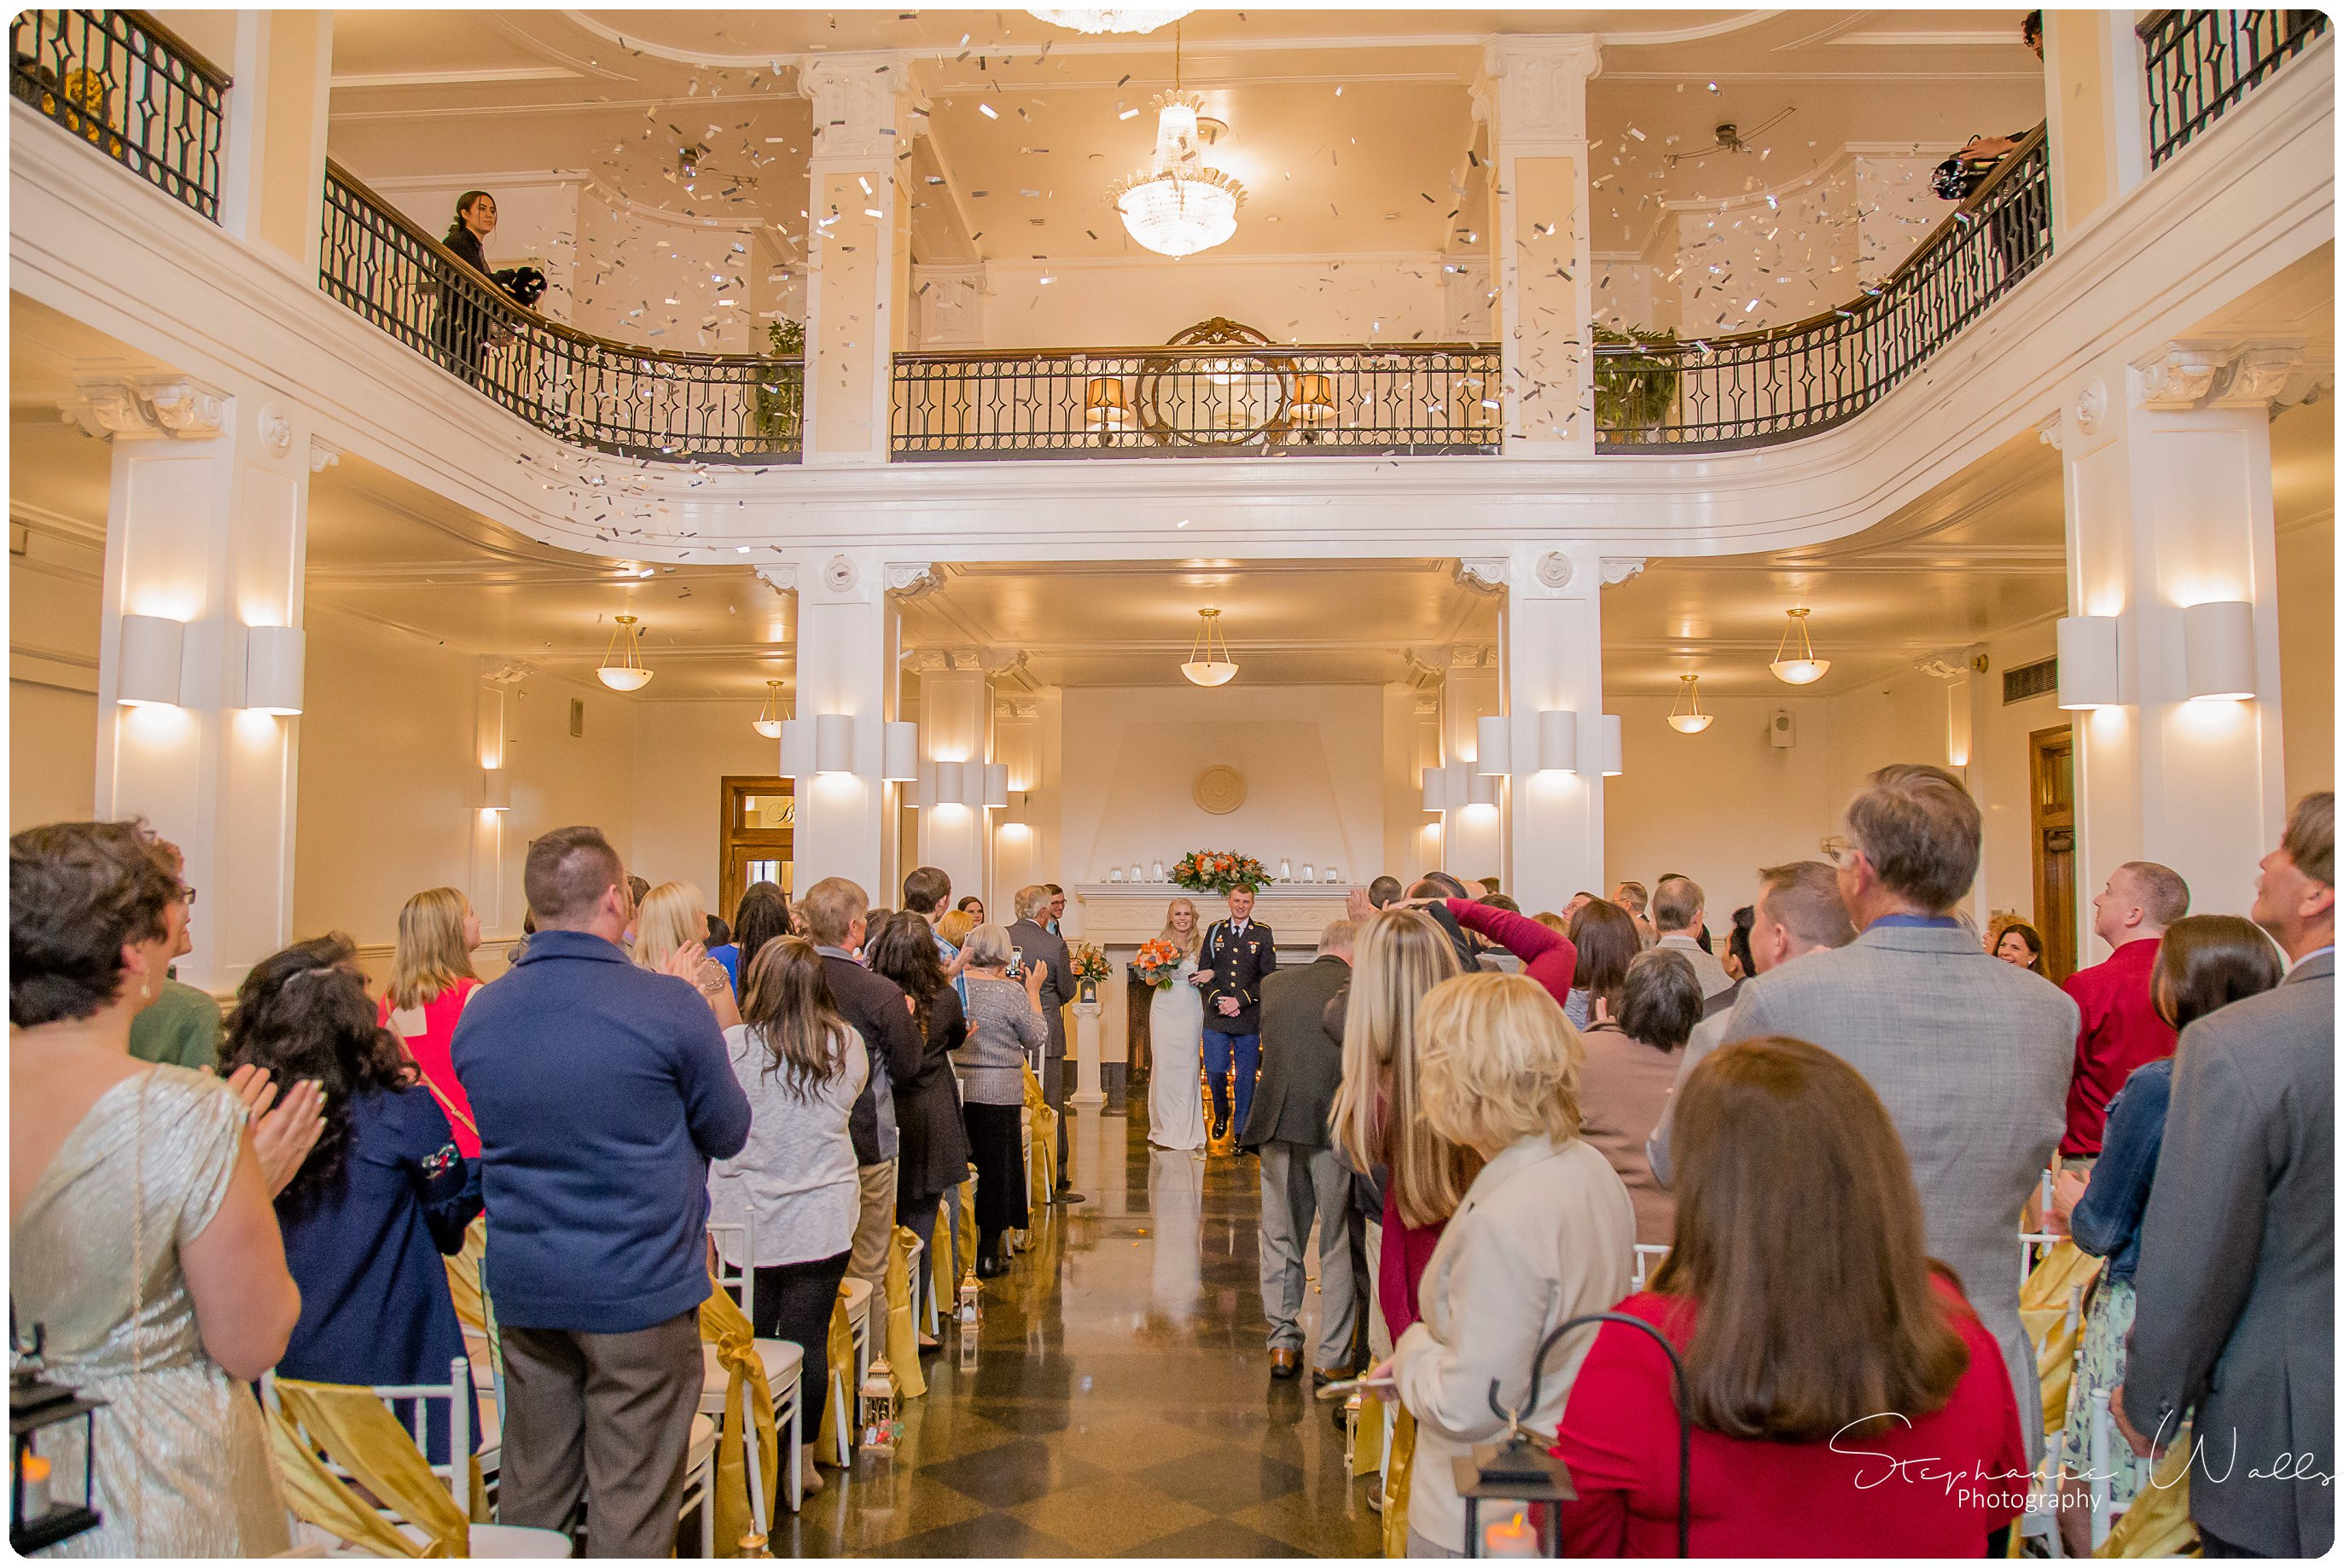 Sears Ceremony 208 The Hero & The Starlet | Monte Cristo Ballroom | Stephanie Walls Photography Weddings